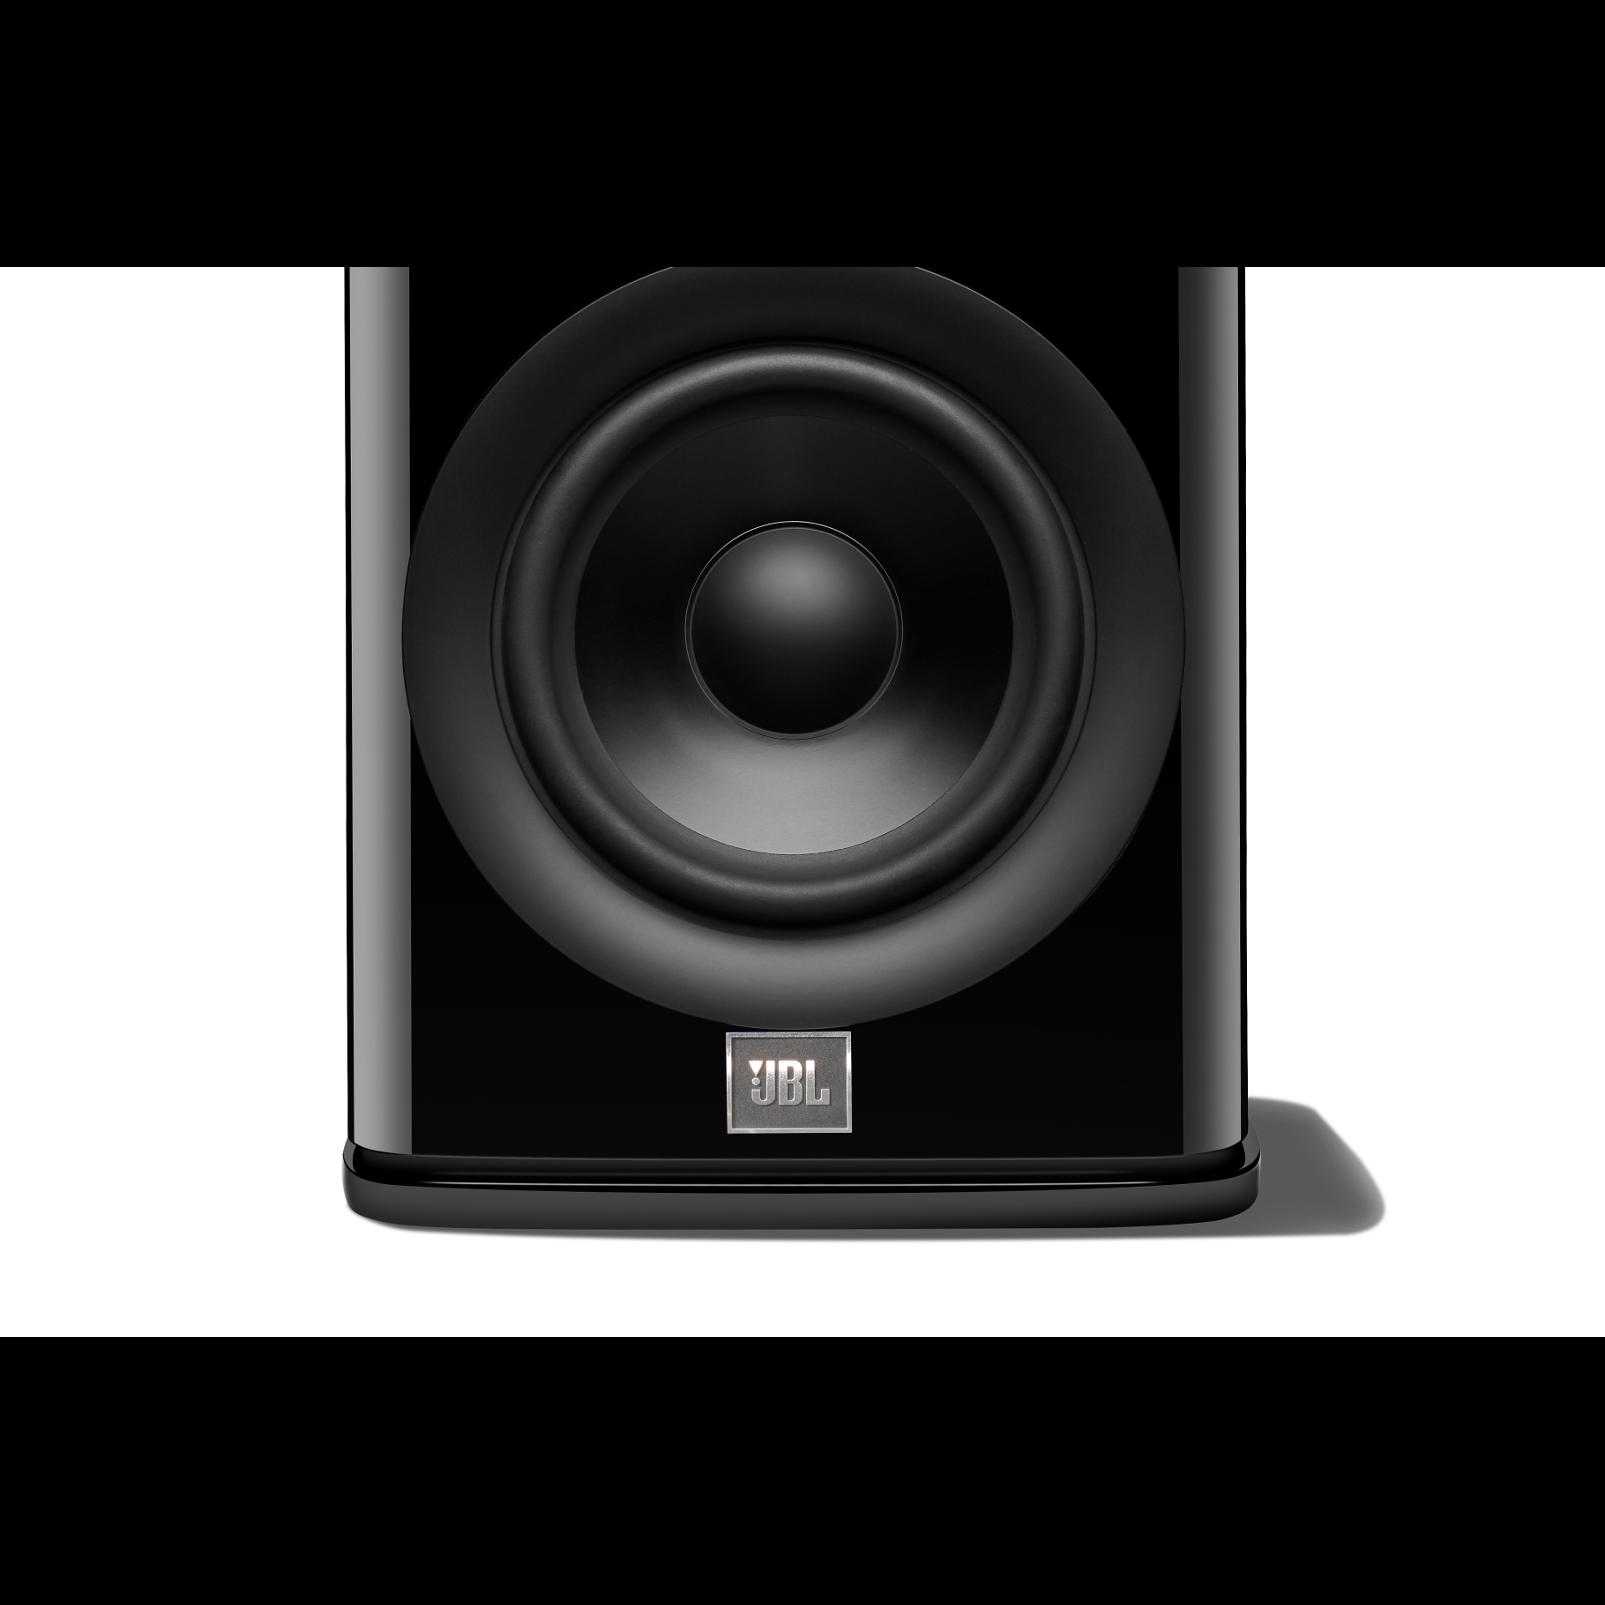 HDI-1600 - Black Gloss - 2-way 6.5-inch (165mm) Bookshelf Loudspeaker - Detailshot 1